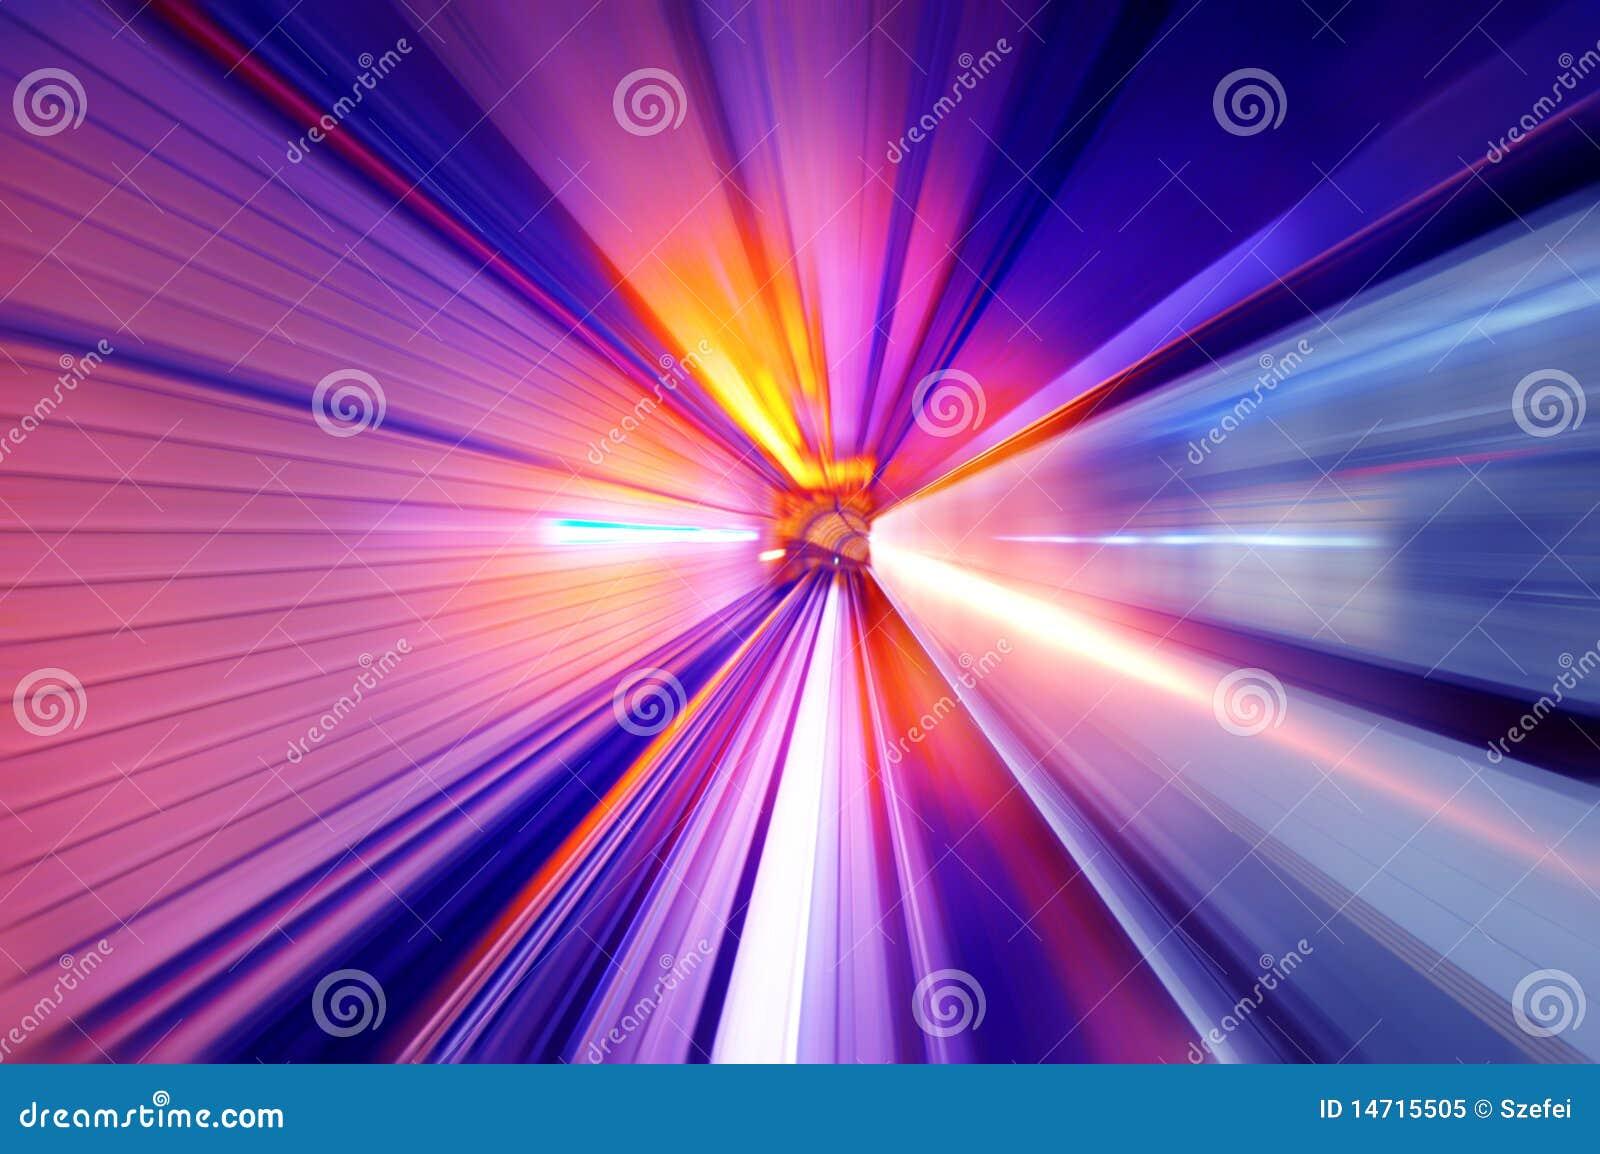 Neon light tunnel royalty free stock photo image 14715505 - Luces de neon ...